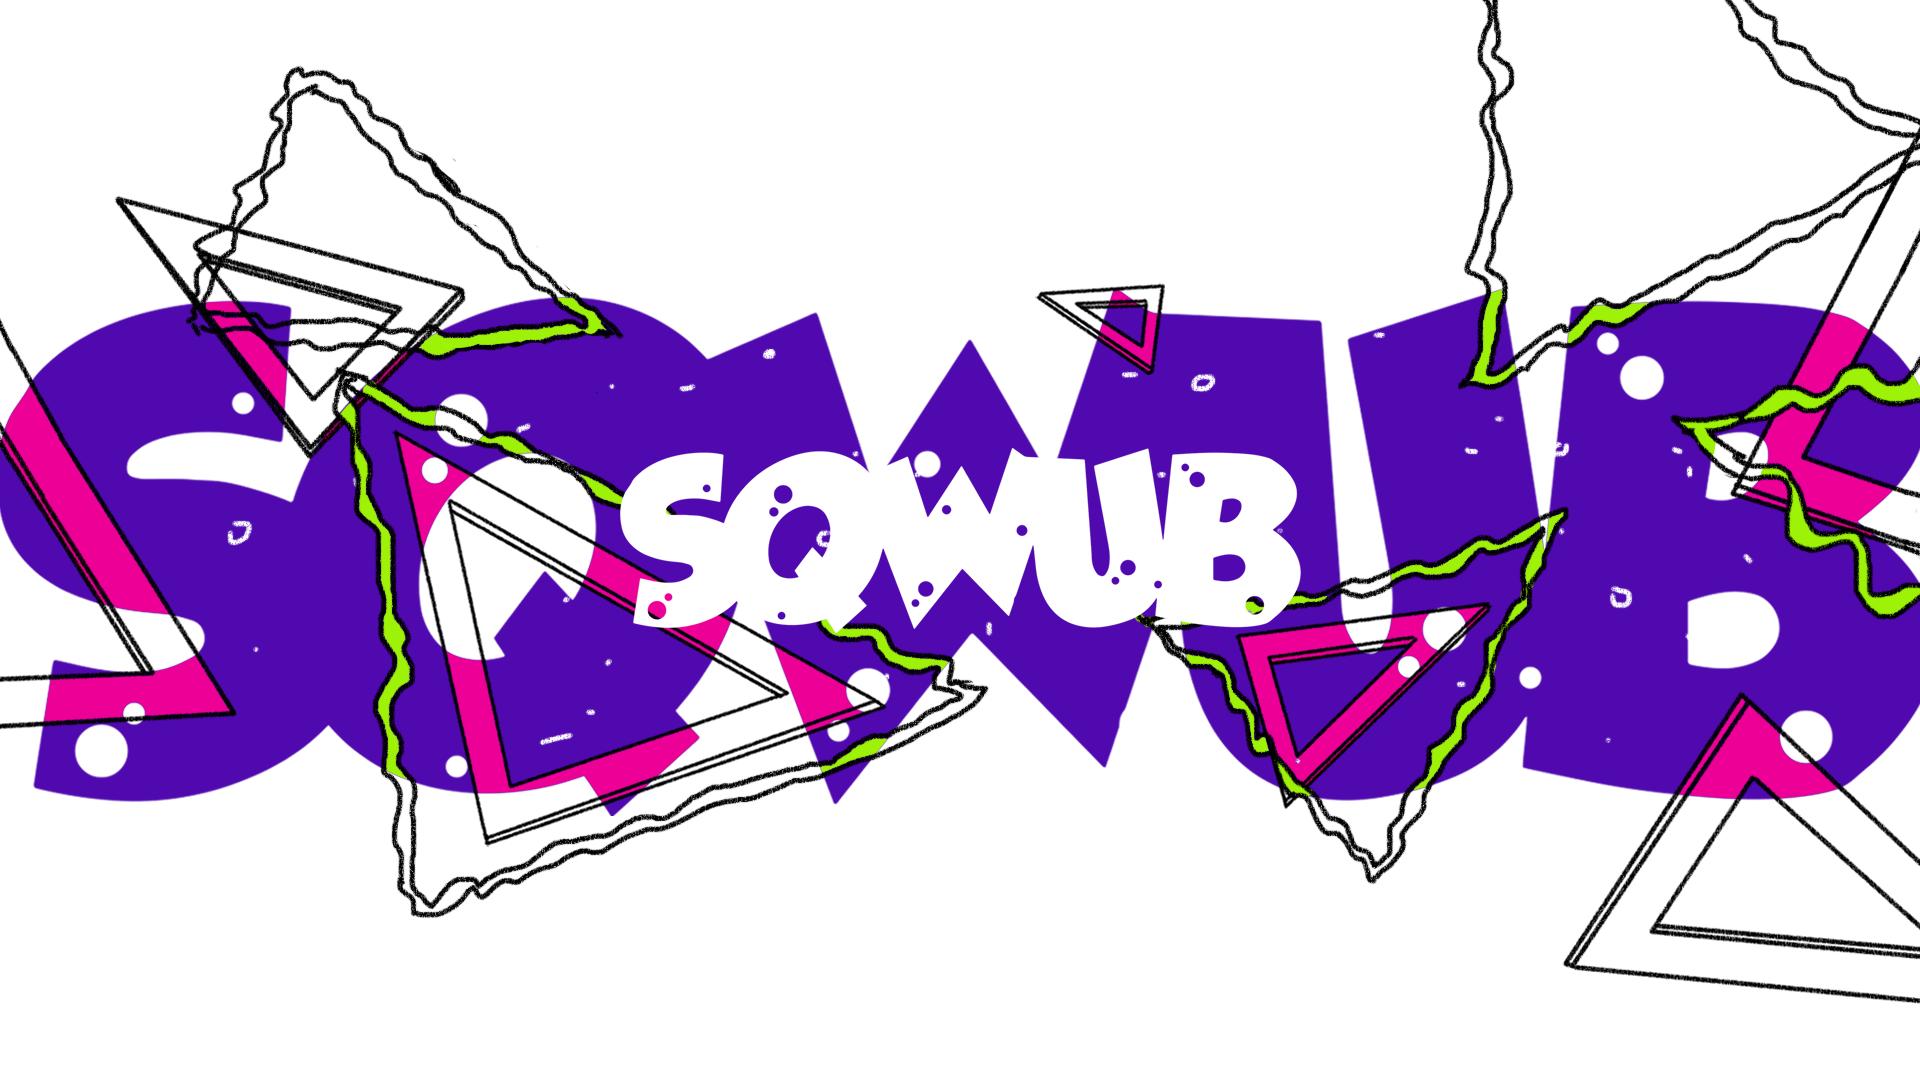 SQWUB-Storyboard-17.png